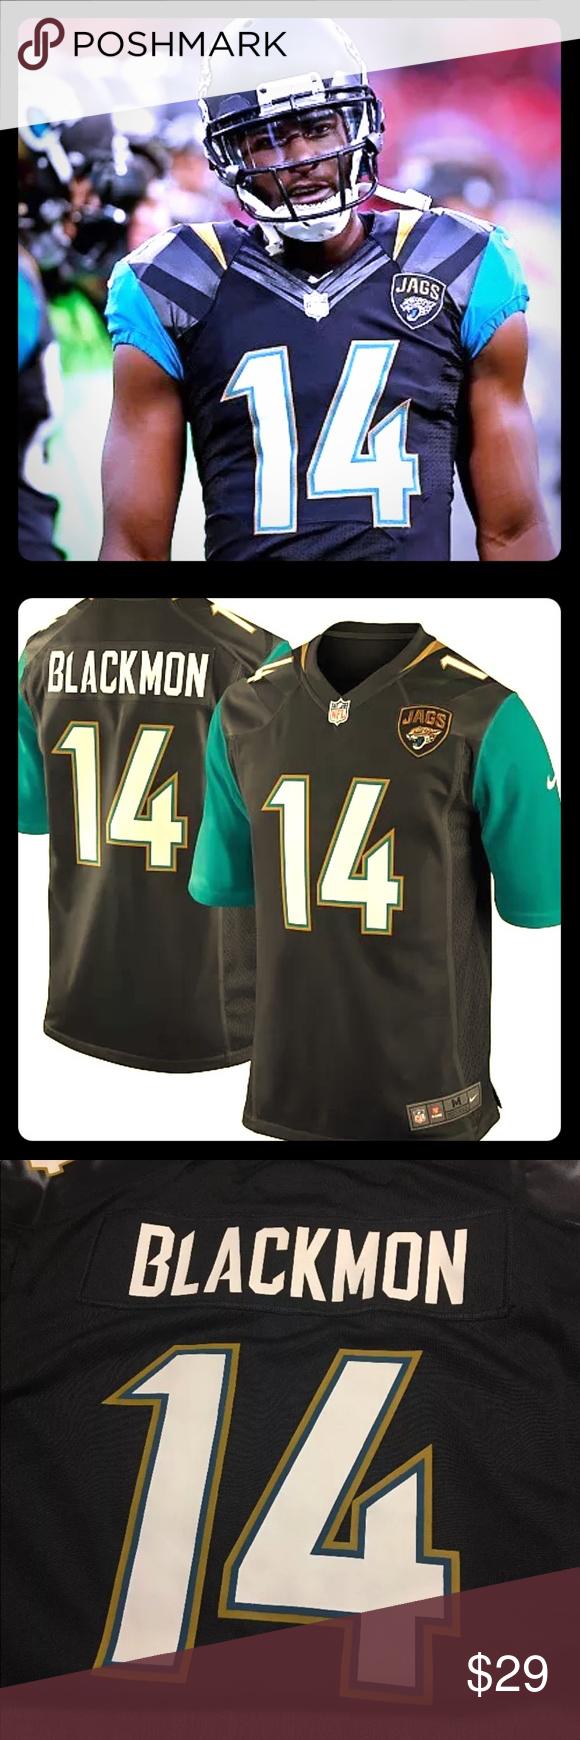 justin blackmon jersey